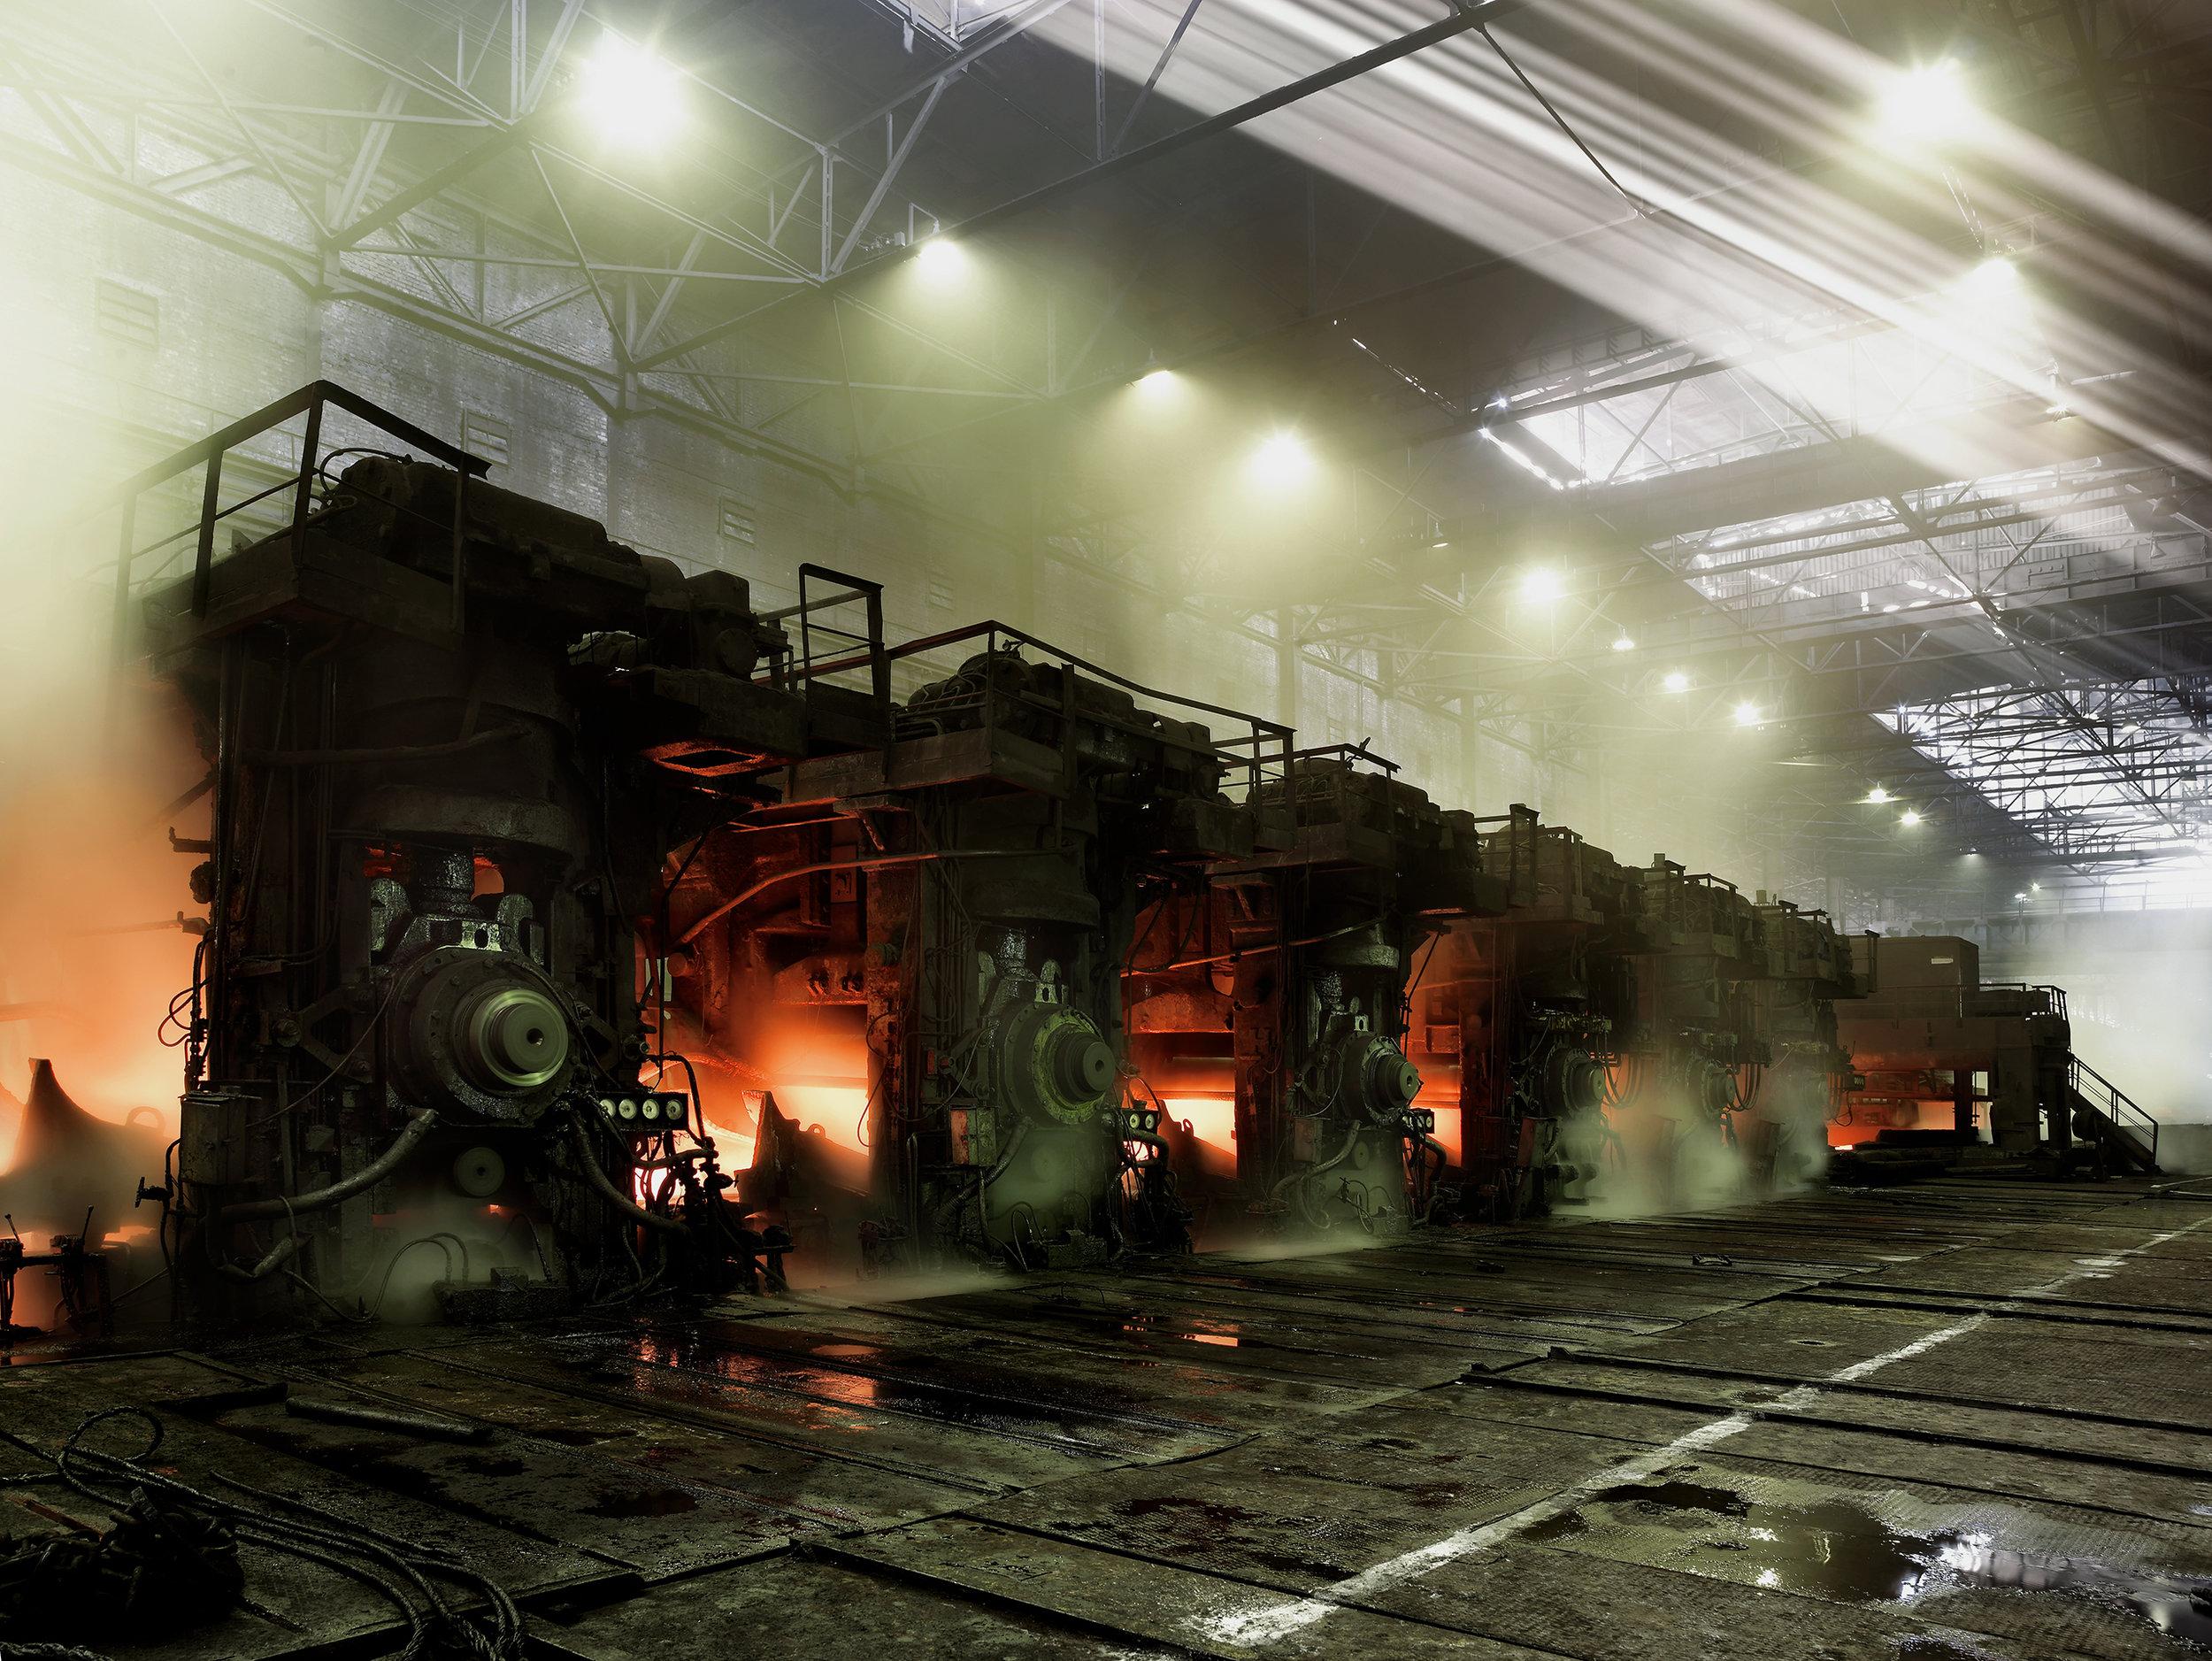 Steel mill 8, Ukraine, 2007.